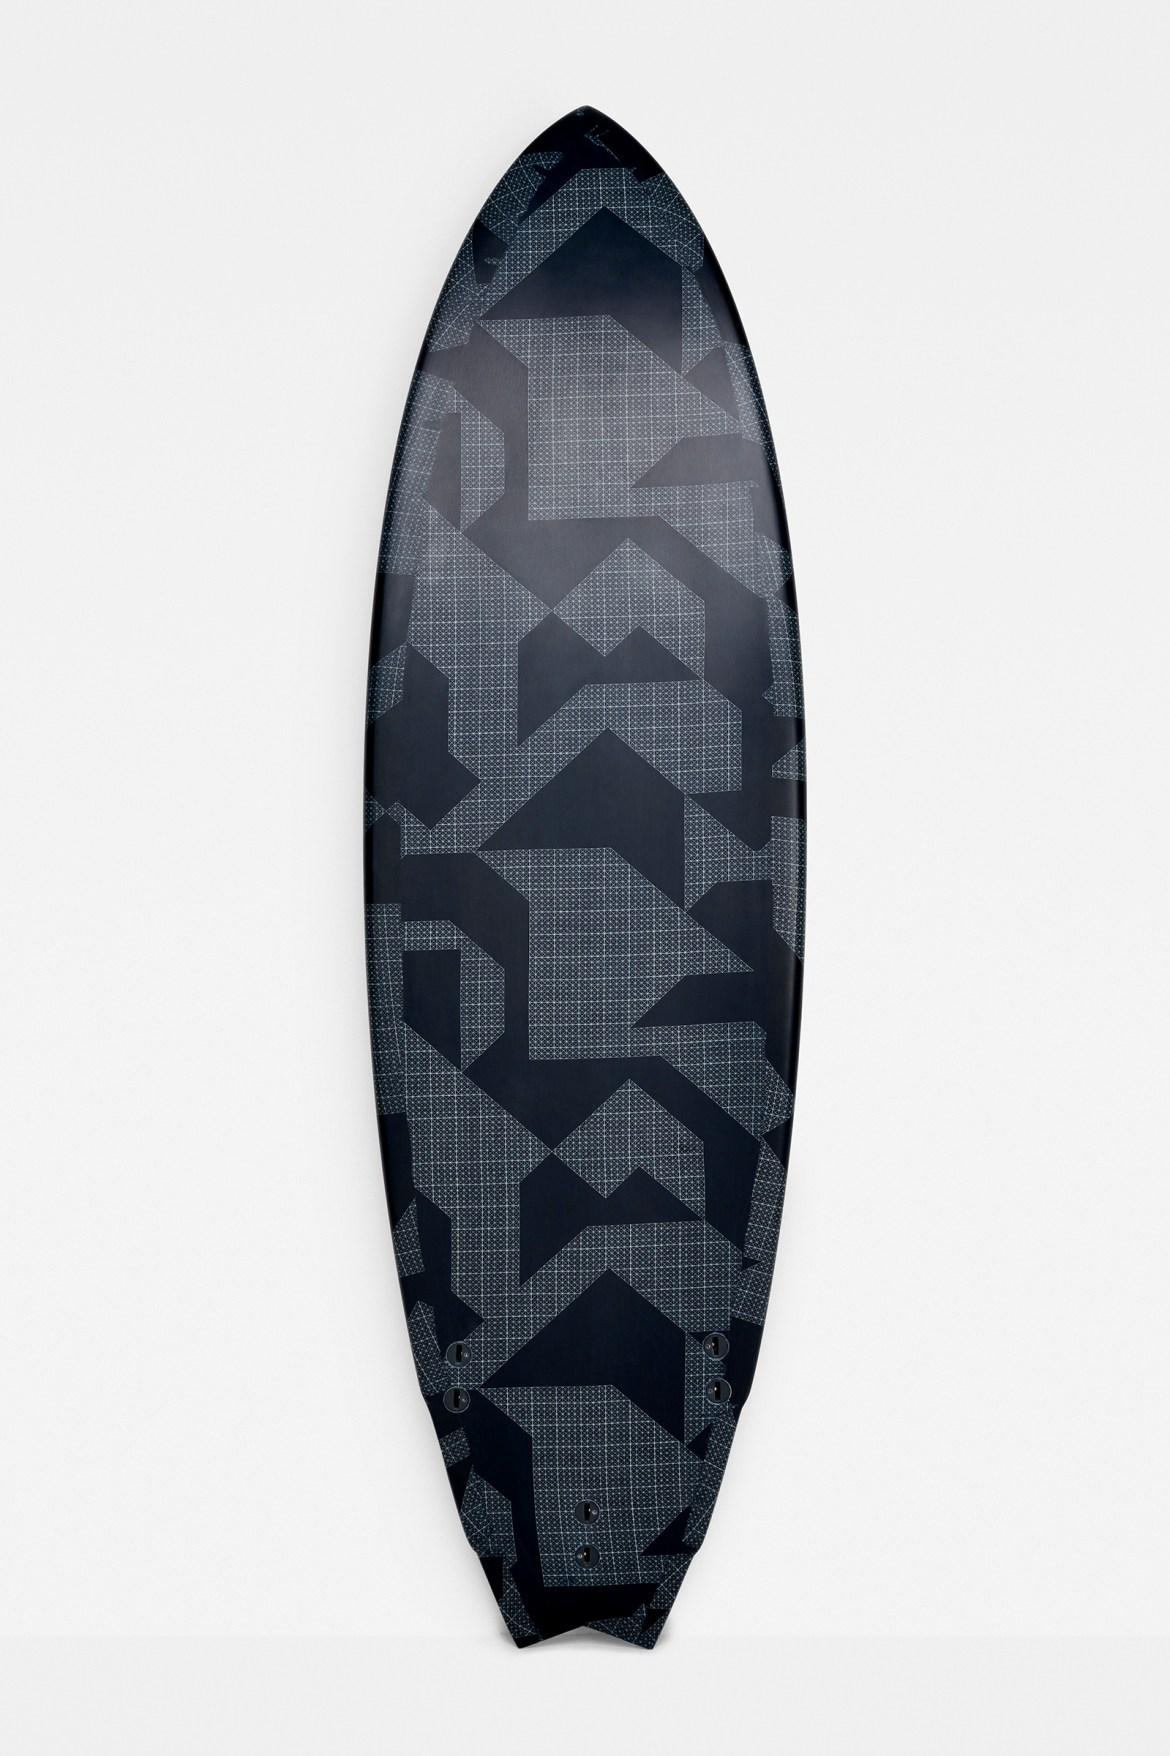 15289032_surfboard_B_004